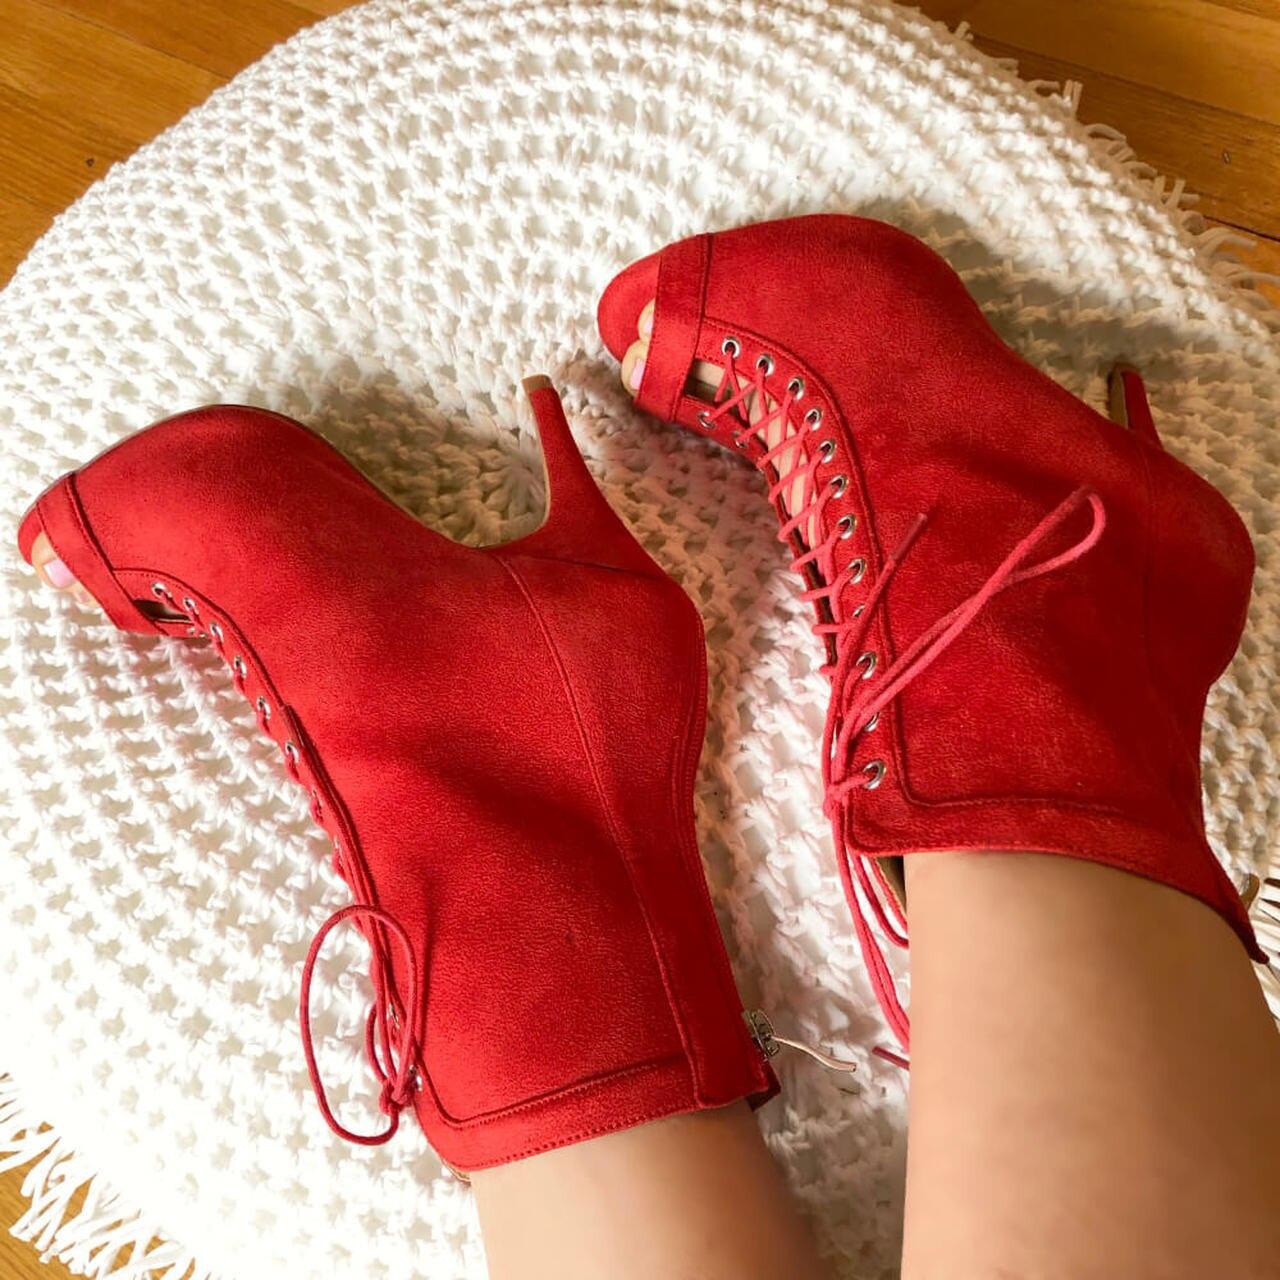 Discounts Salsa Jazz Ballroom Latin Dance Shoes For Dancing Women Standard Latina High Heels Rhinestones 1032 Summer Boot Red